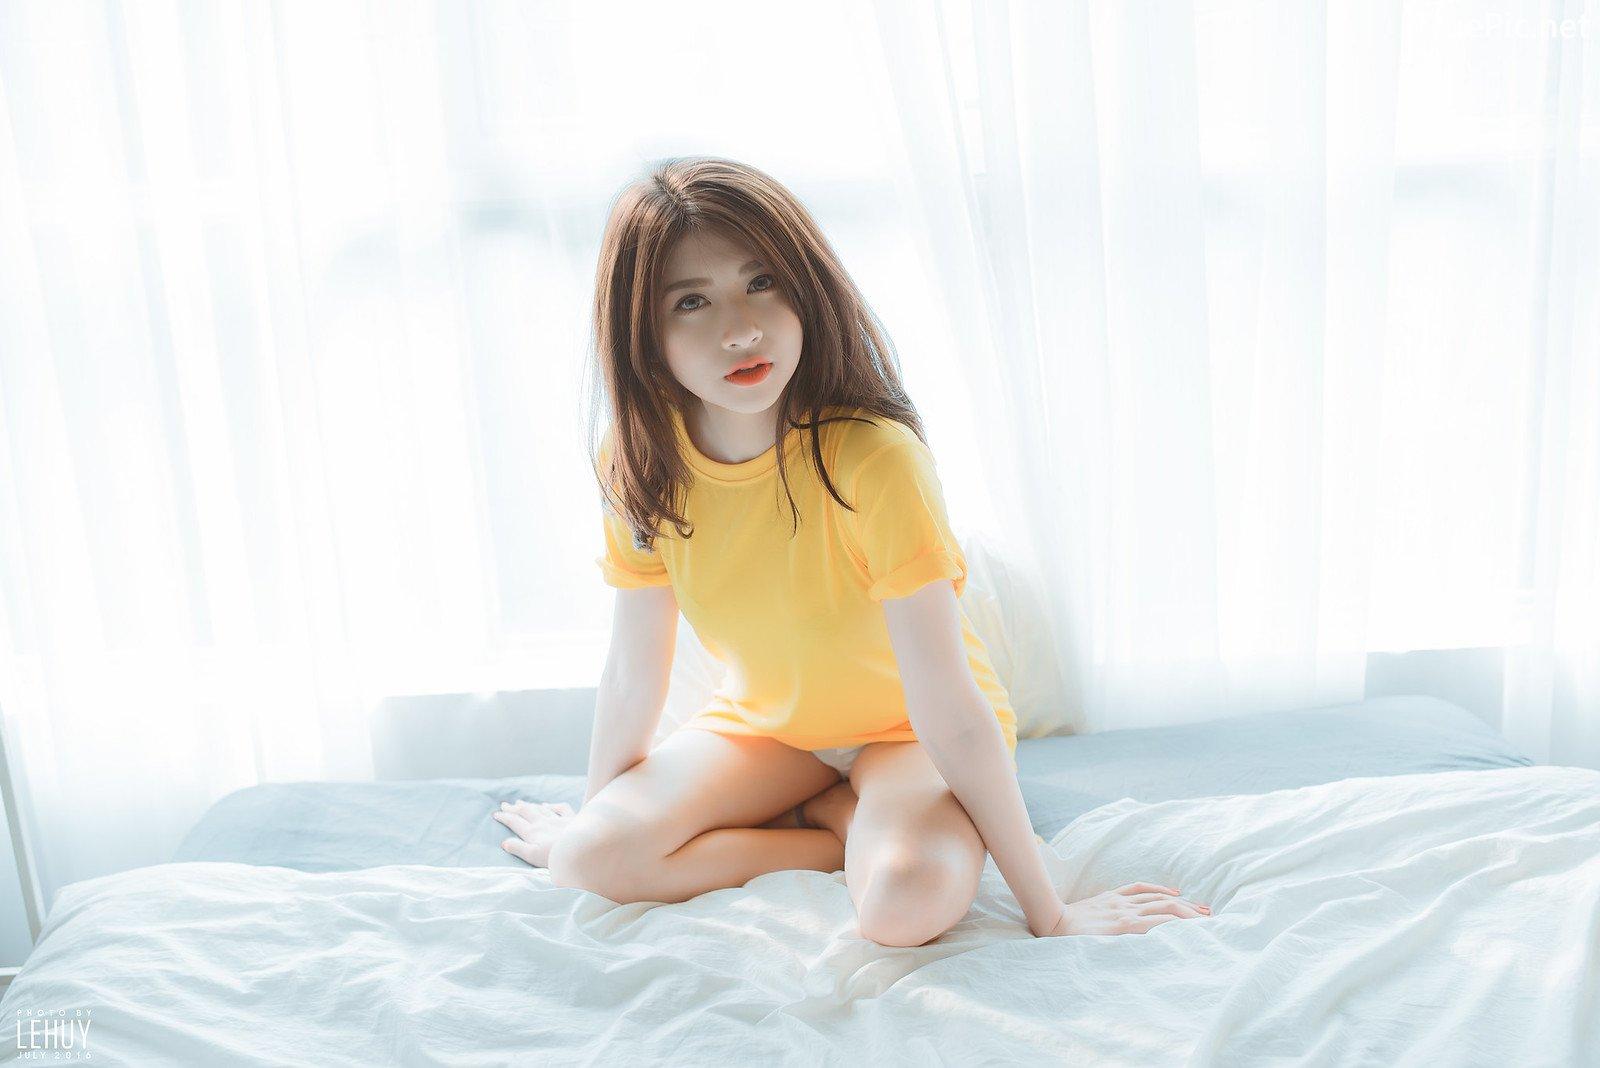 Image-Vietnamese-Hot-Girl-Photo-Cute-Little-Pikachu-Girl-TruePic.net- Picture-2